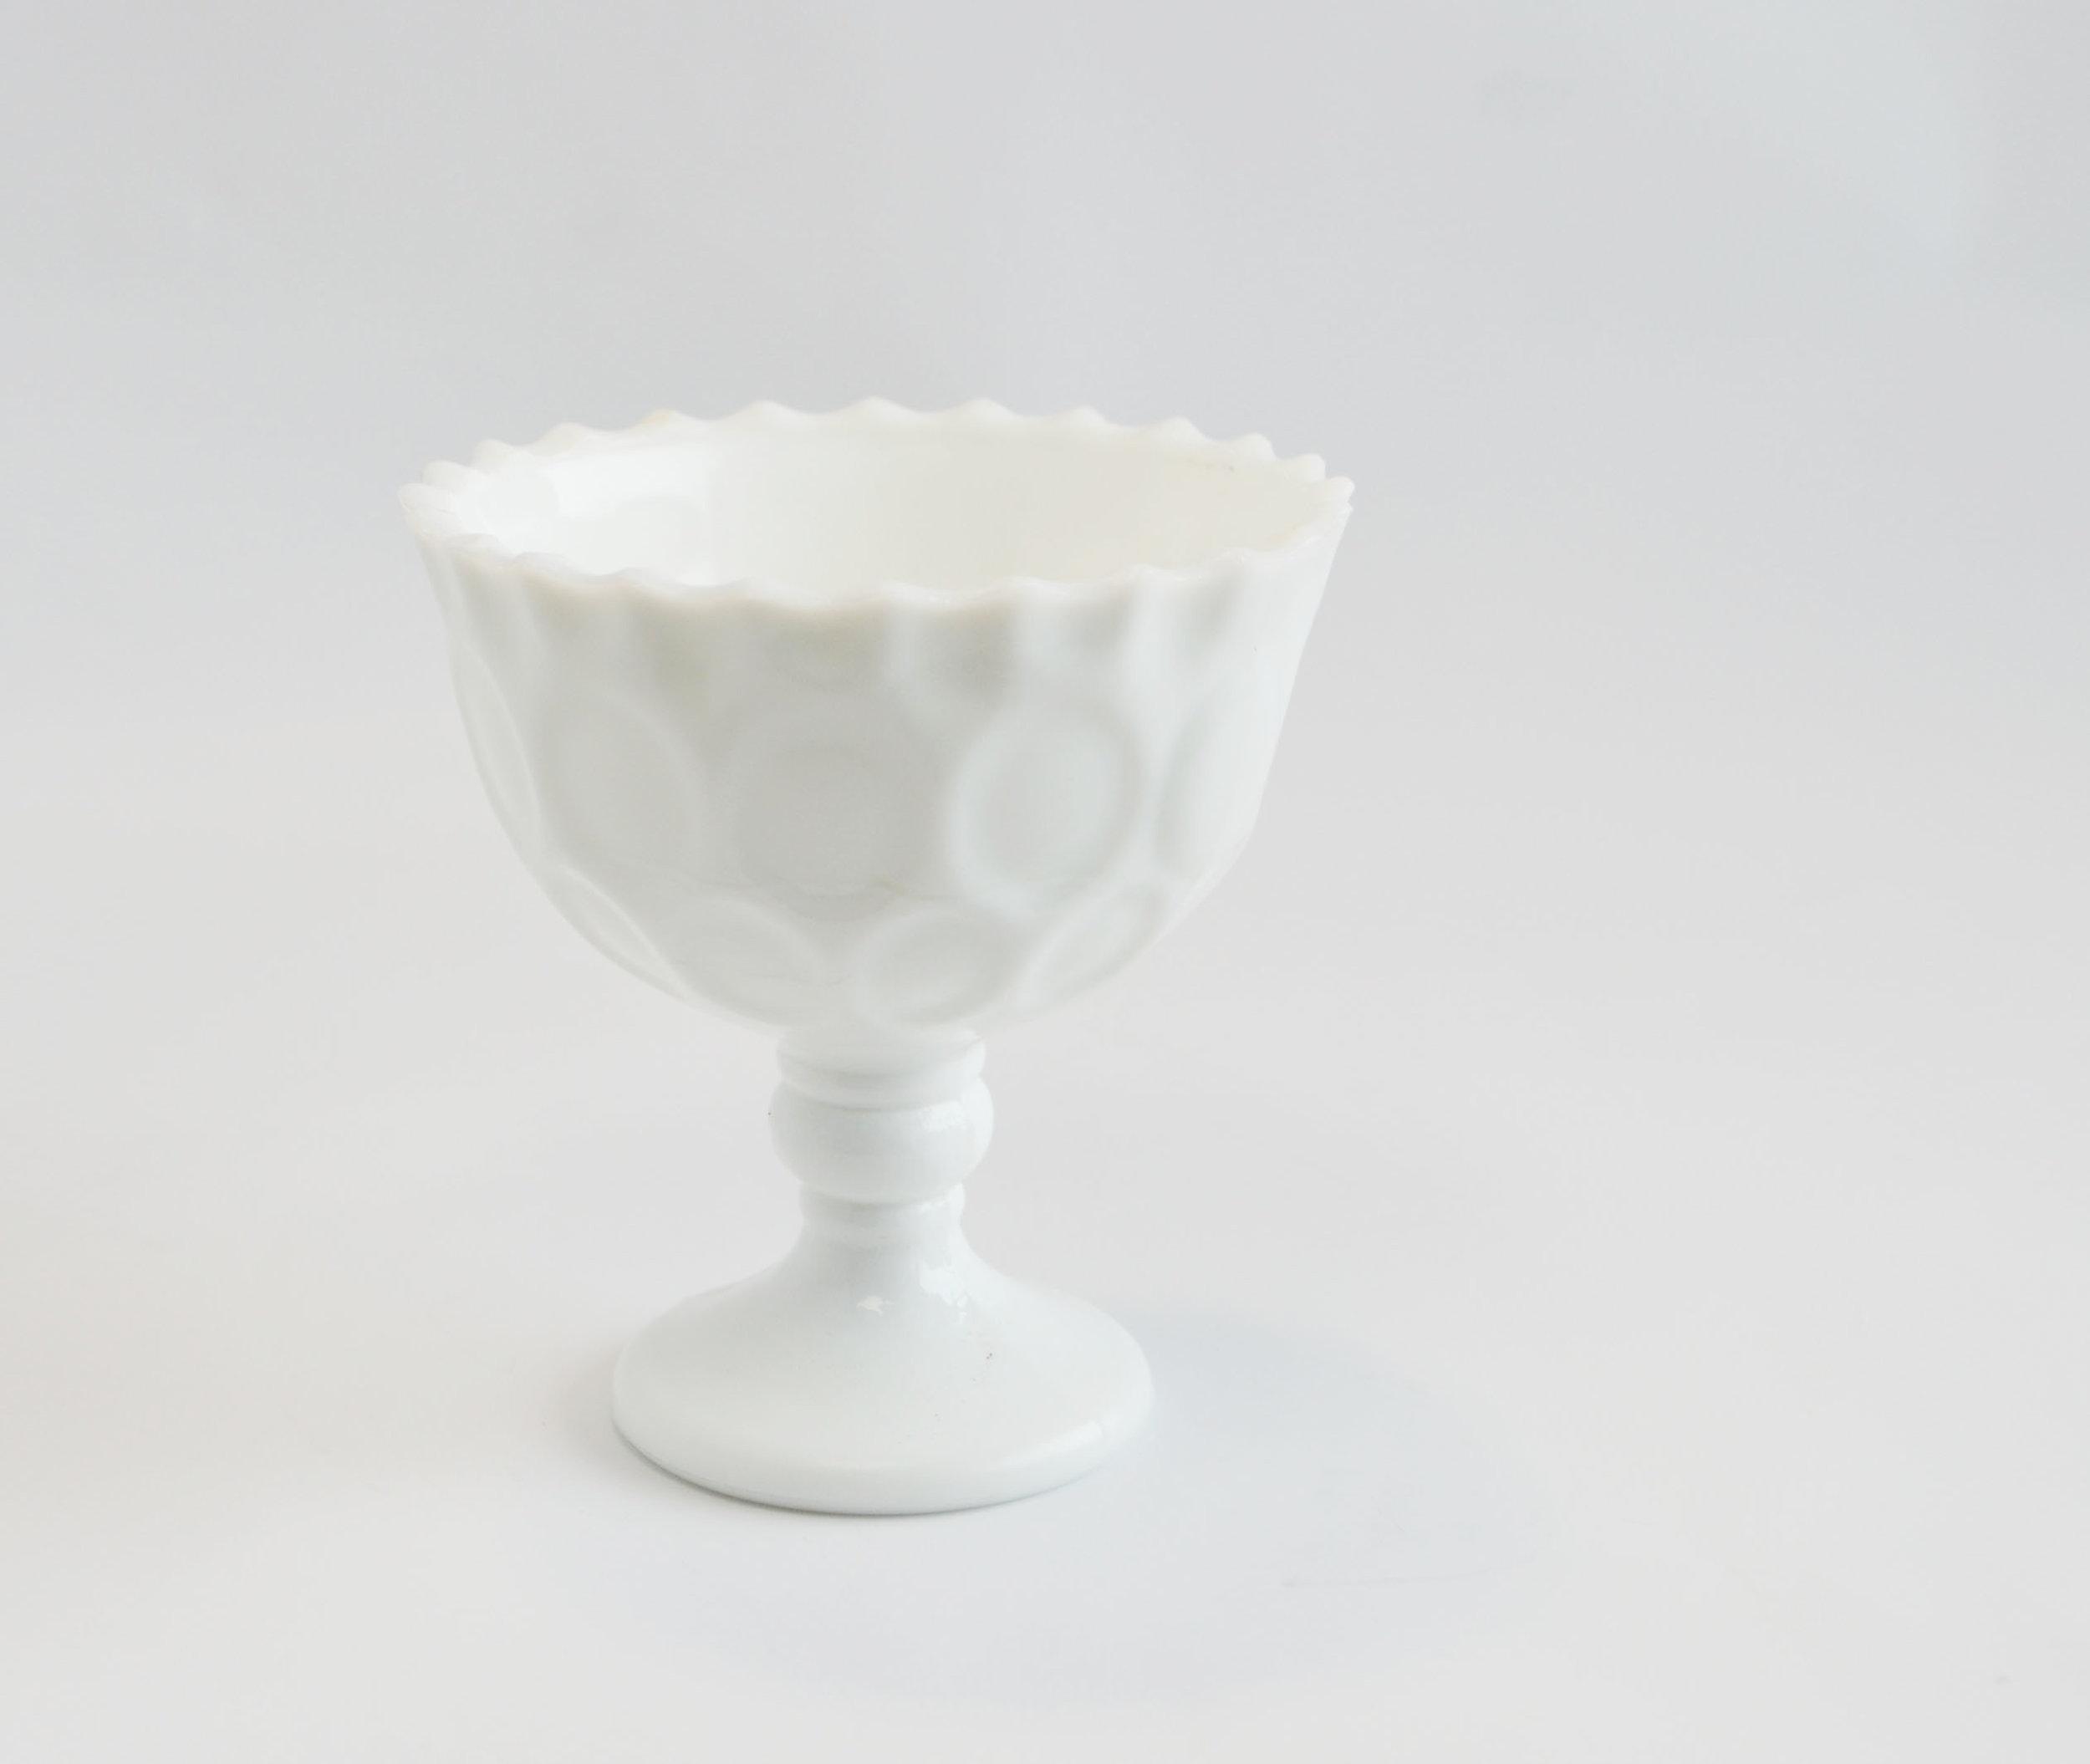 milk glass cups   Quantity: 24  Price: $3.50